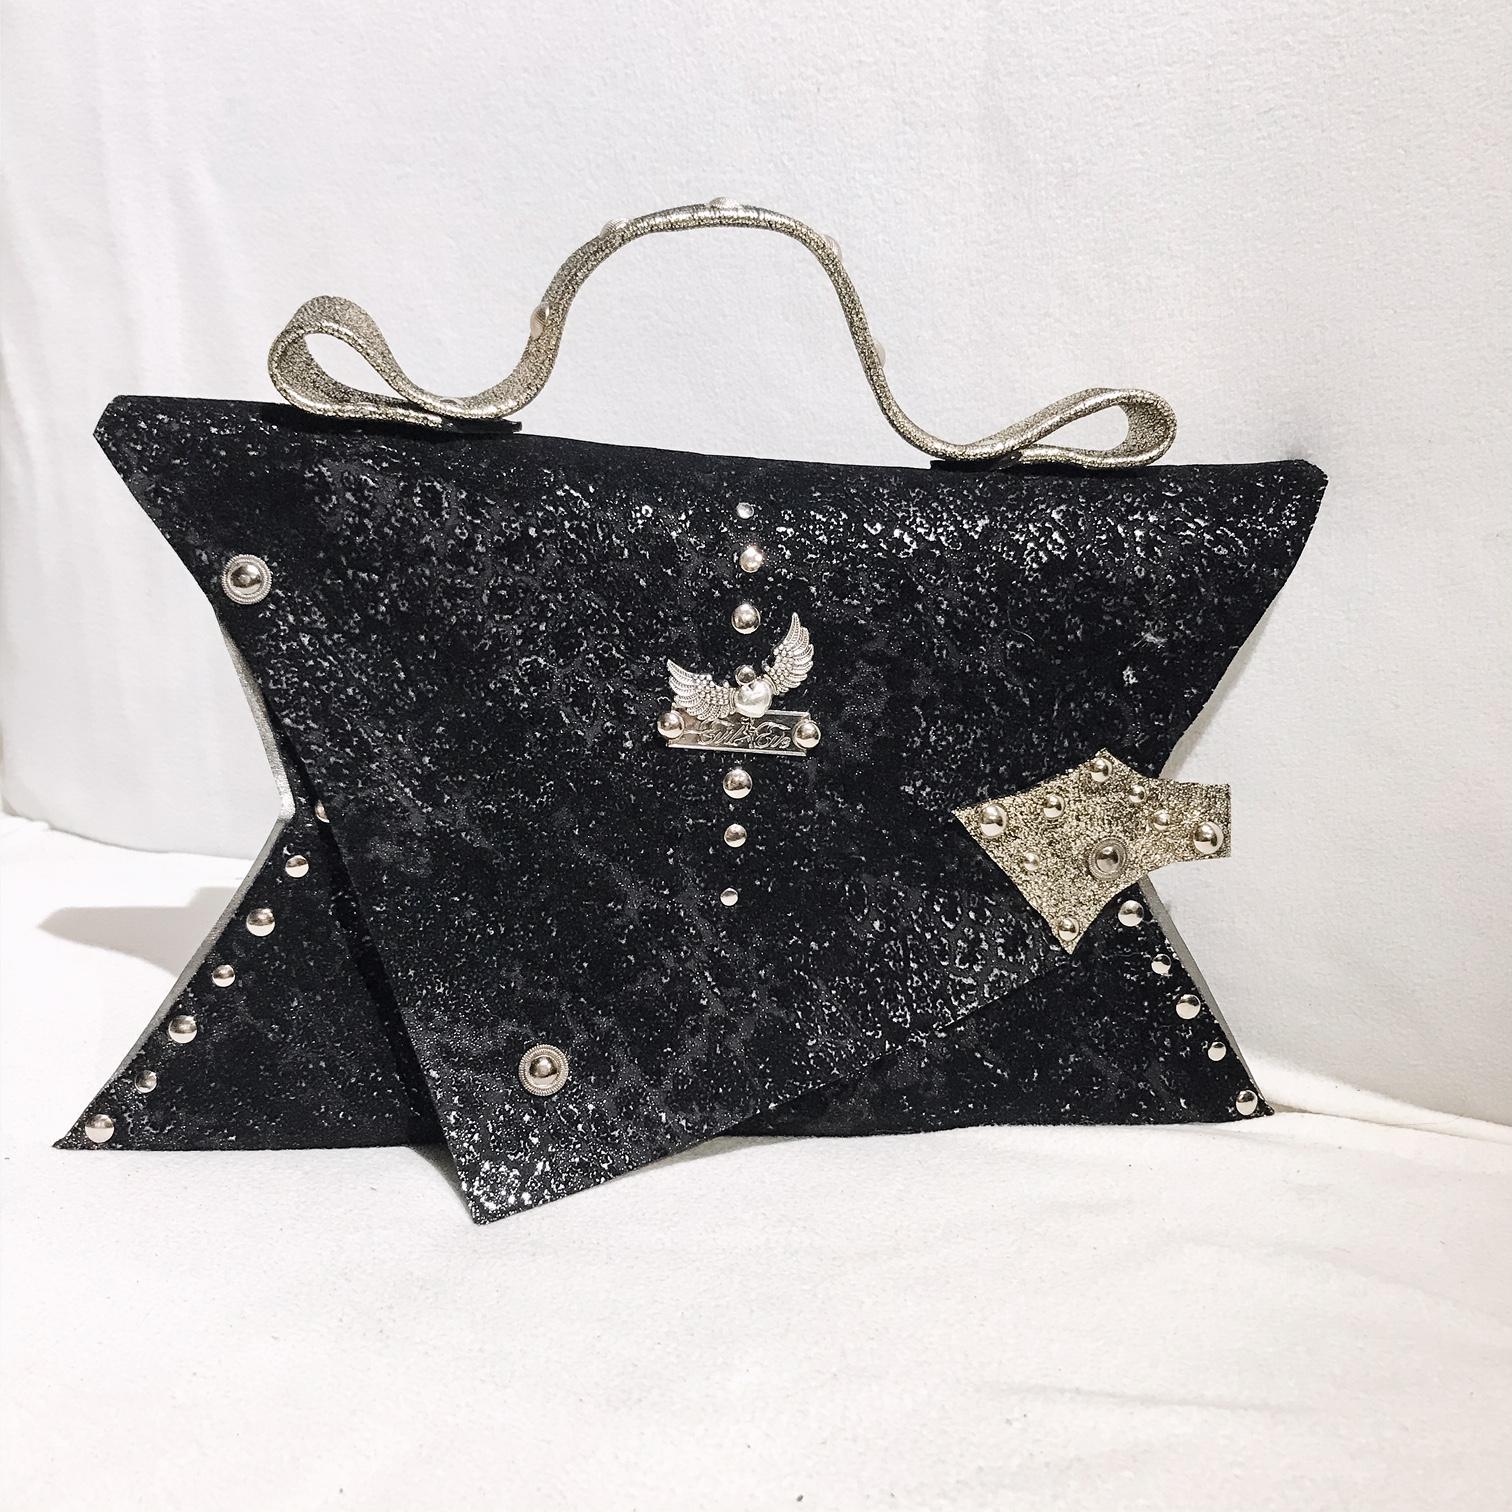 unique handmade leather clutch black passion angel evileve